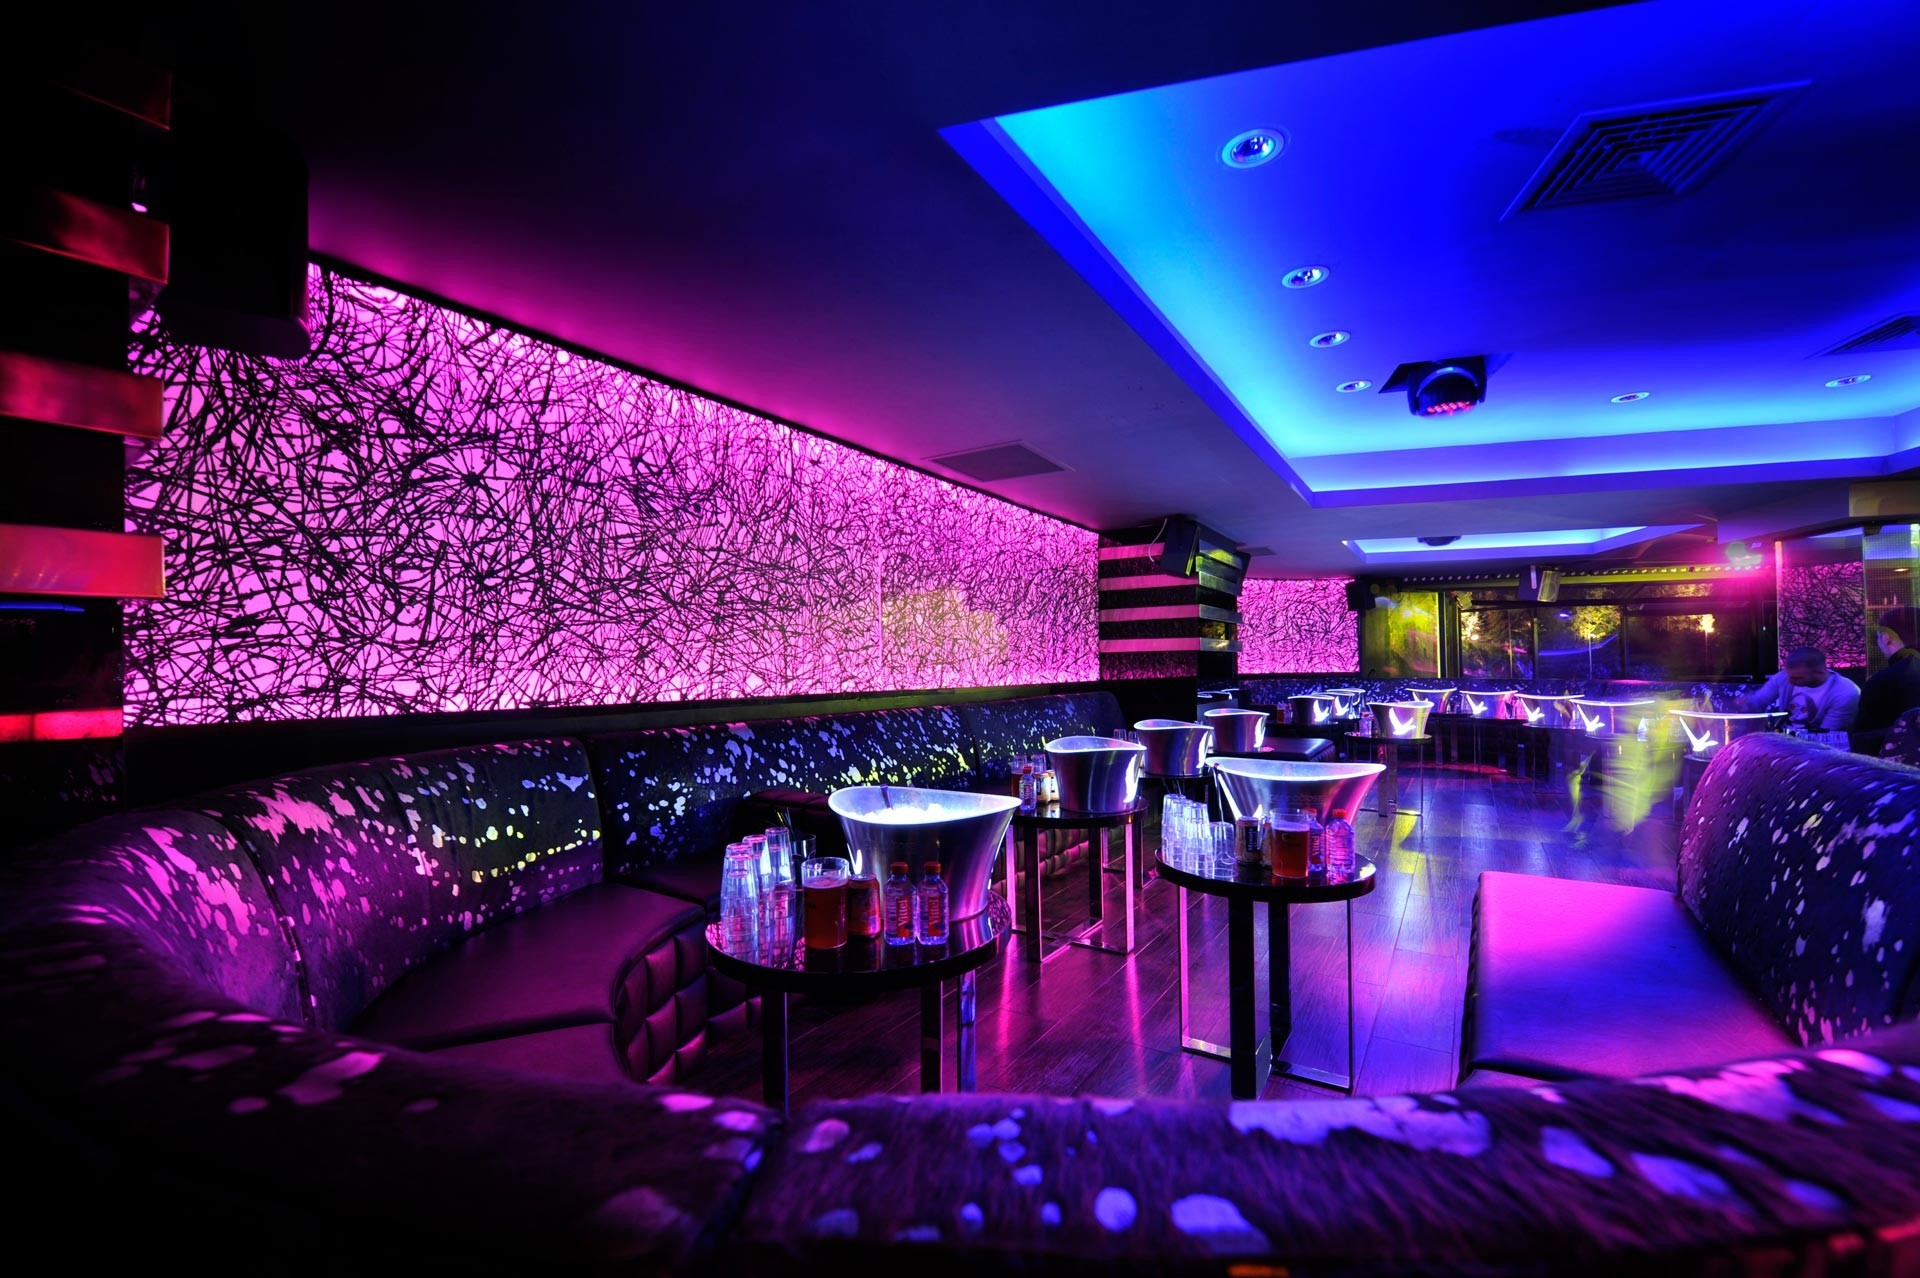 Night club wallpapers - Club lights wallpaper ...